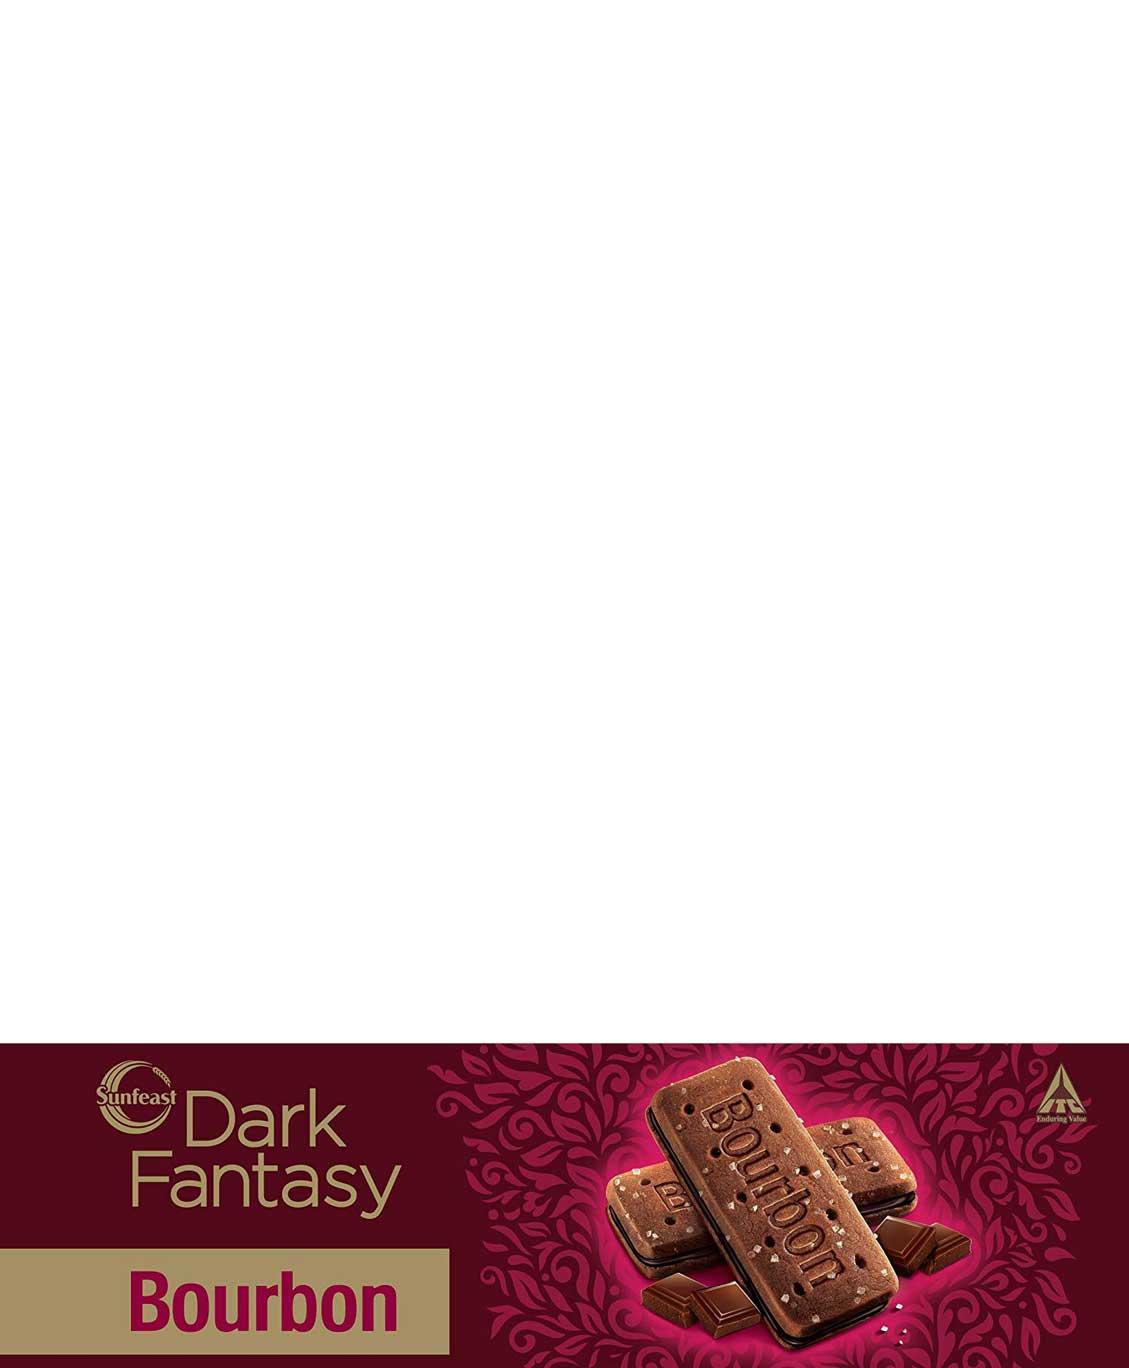 Sunfeast Dark Fantasy Bourbon Bliss 150g